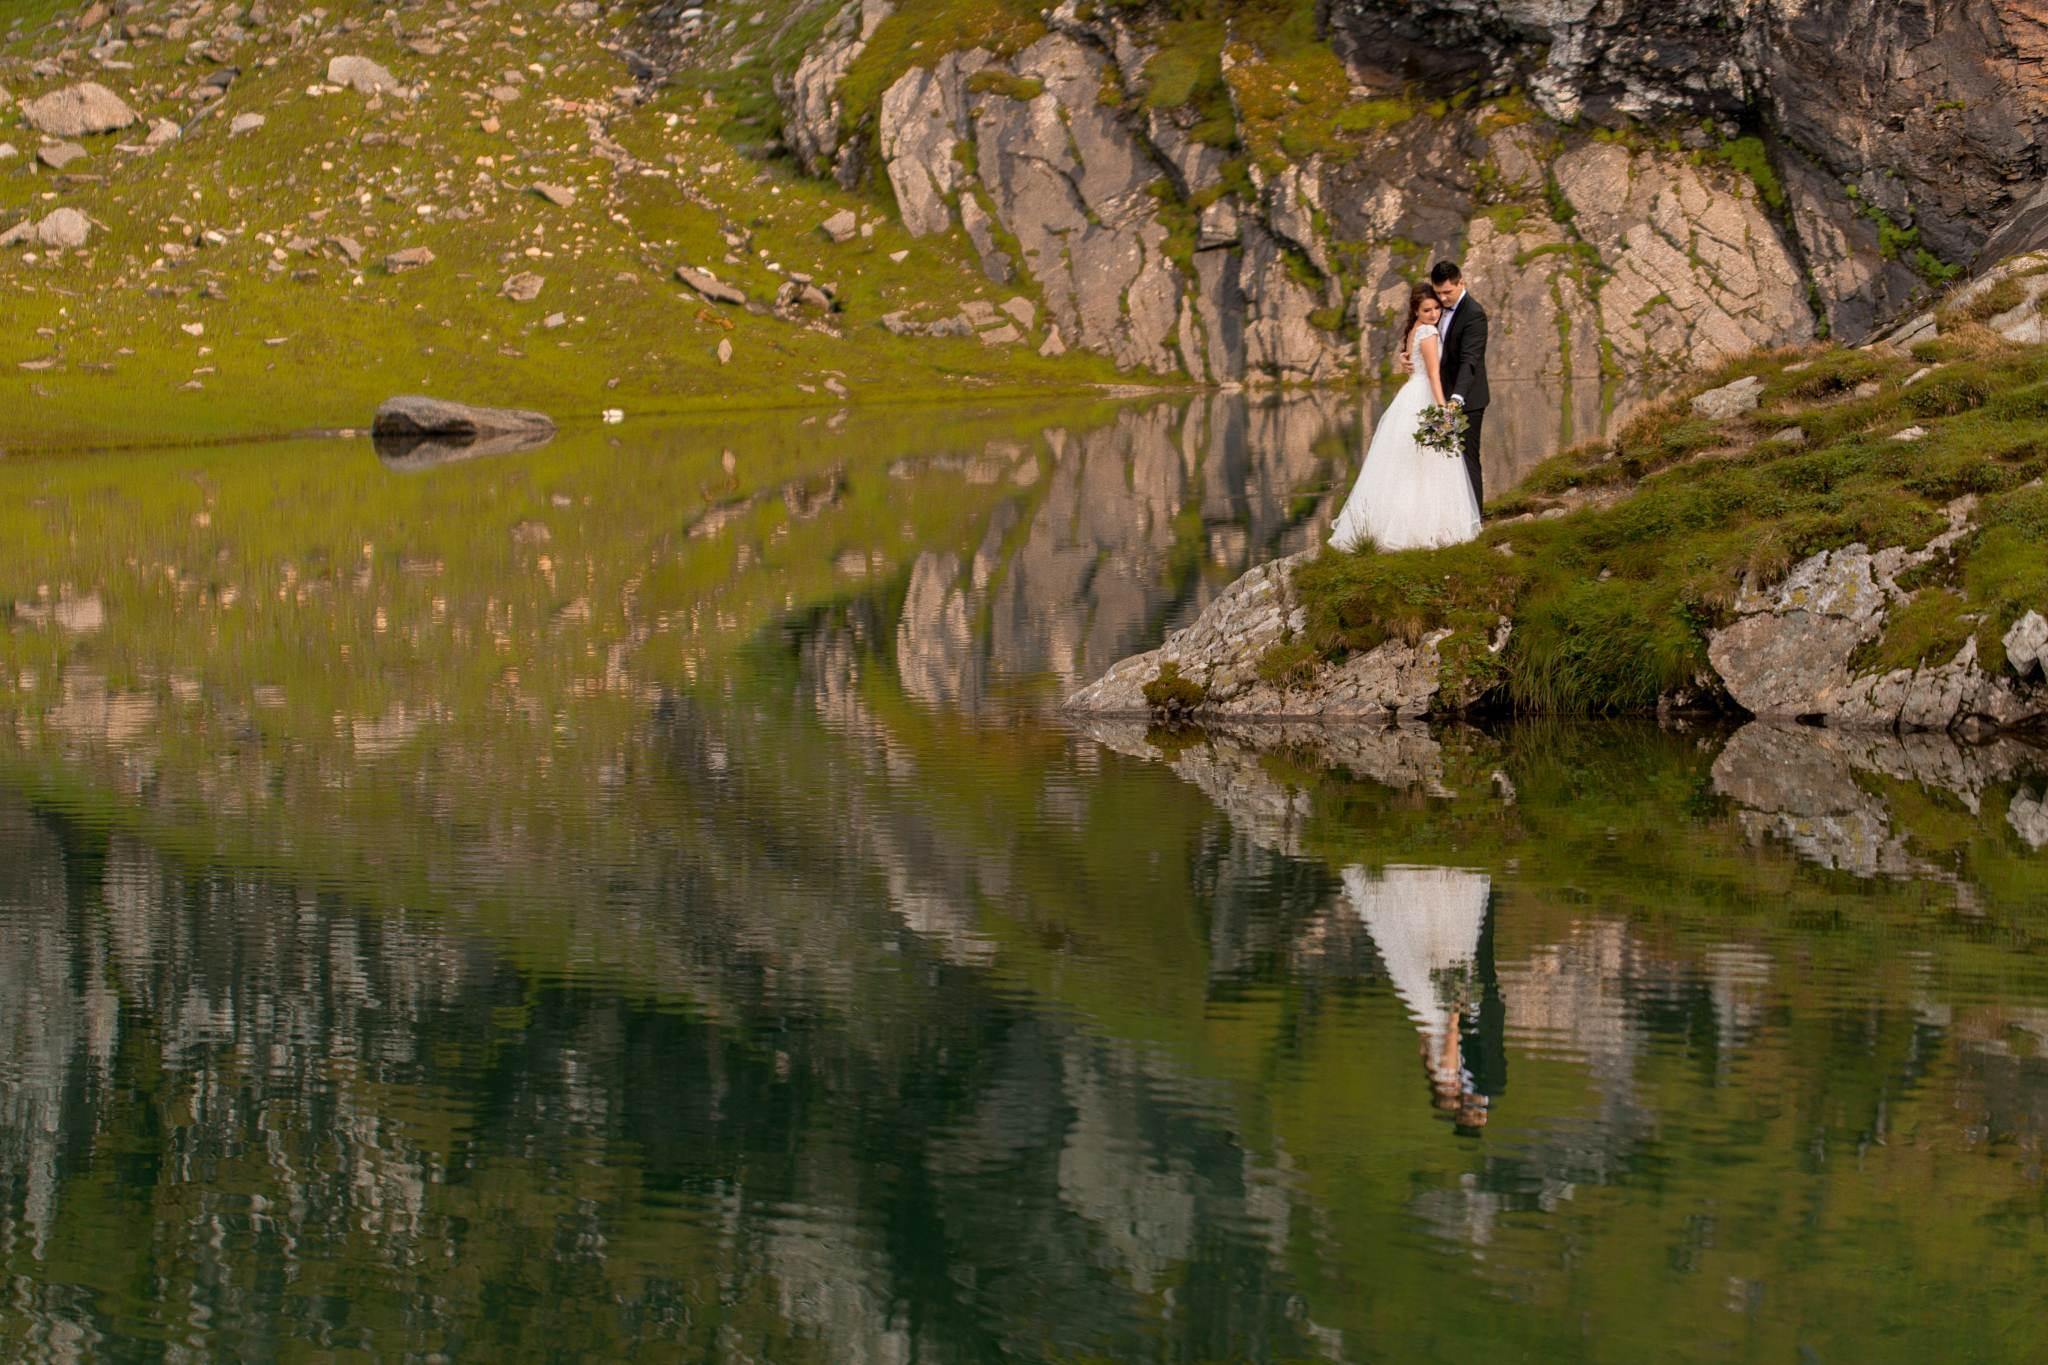 fotografii-nunta-cristina-si-sorin72.jpg